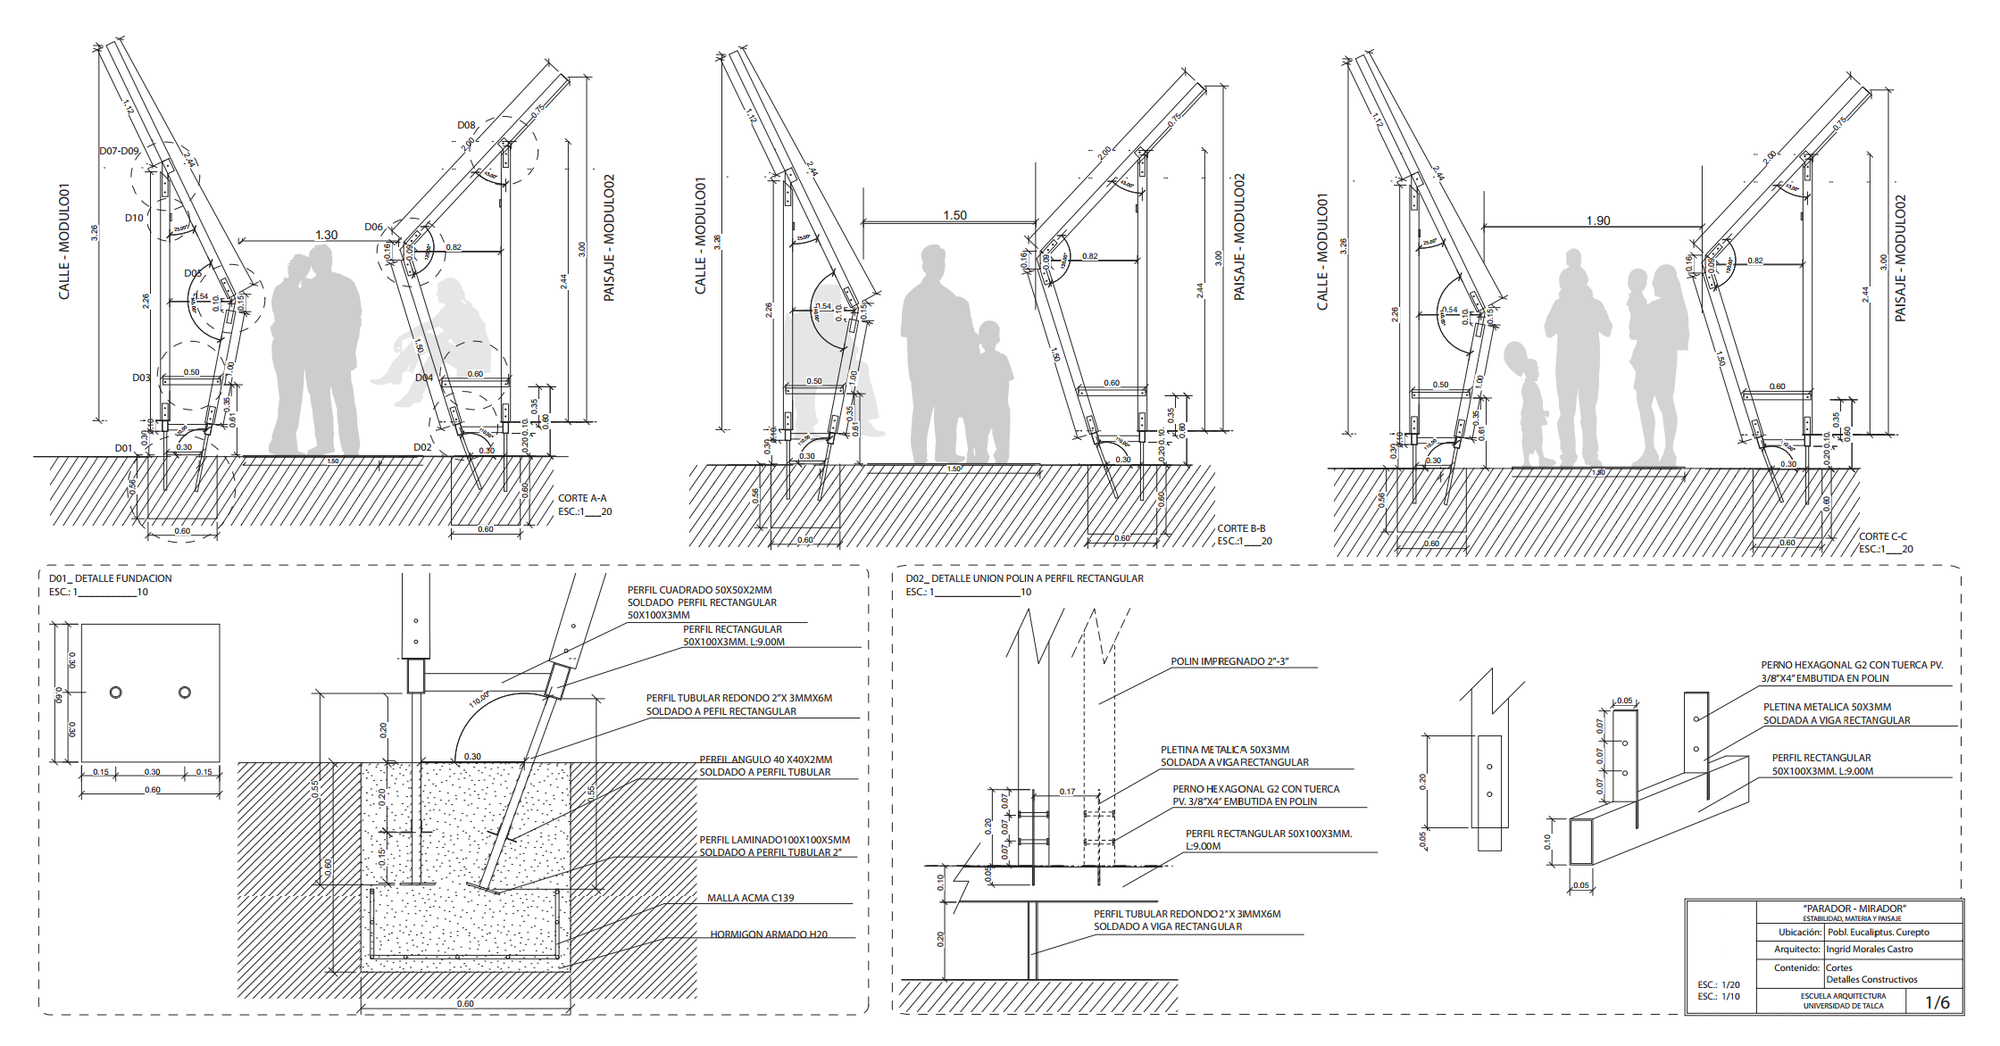 Cortes / Detalles Constructivos